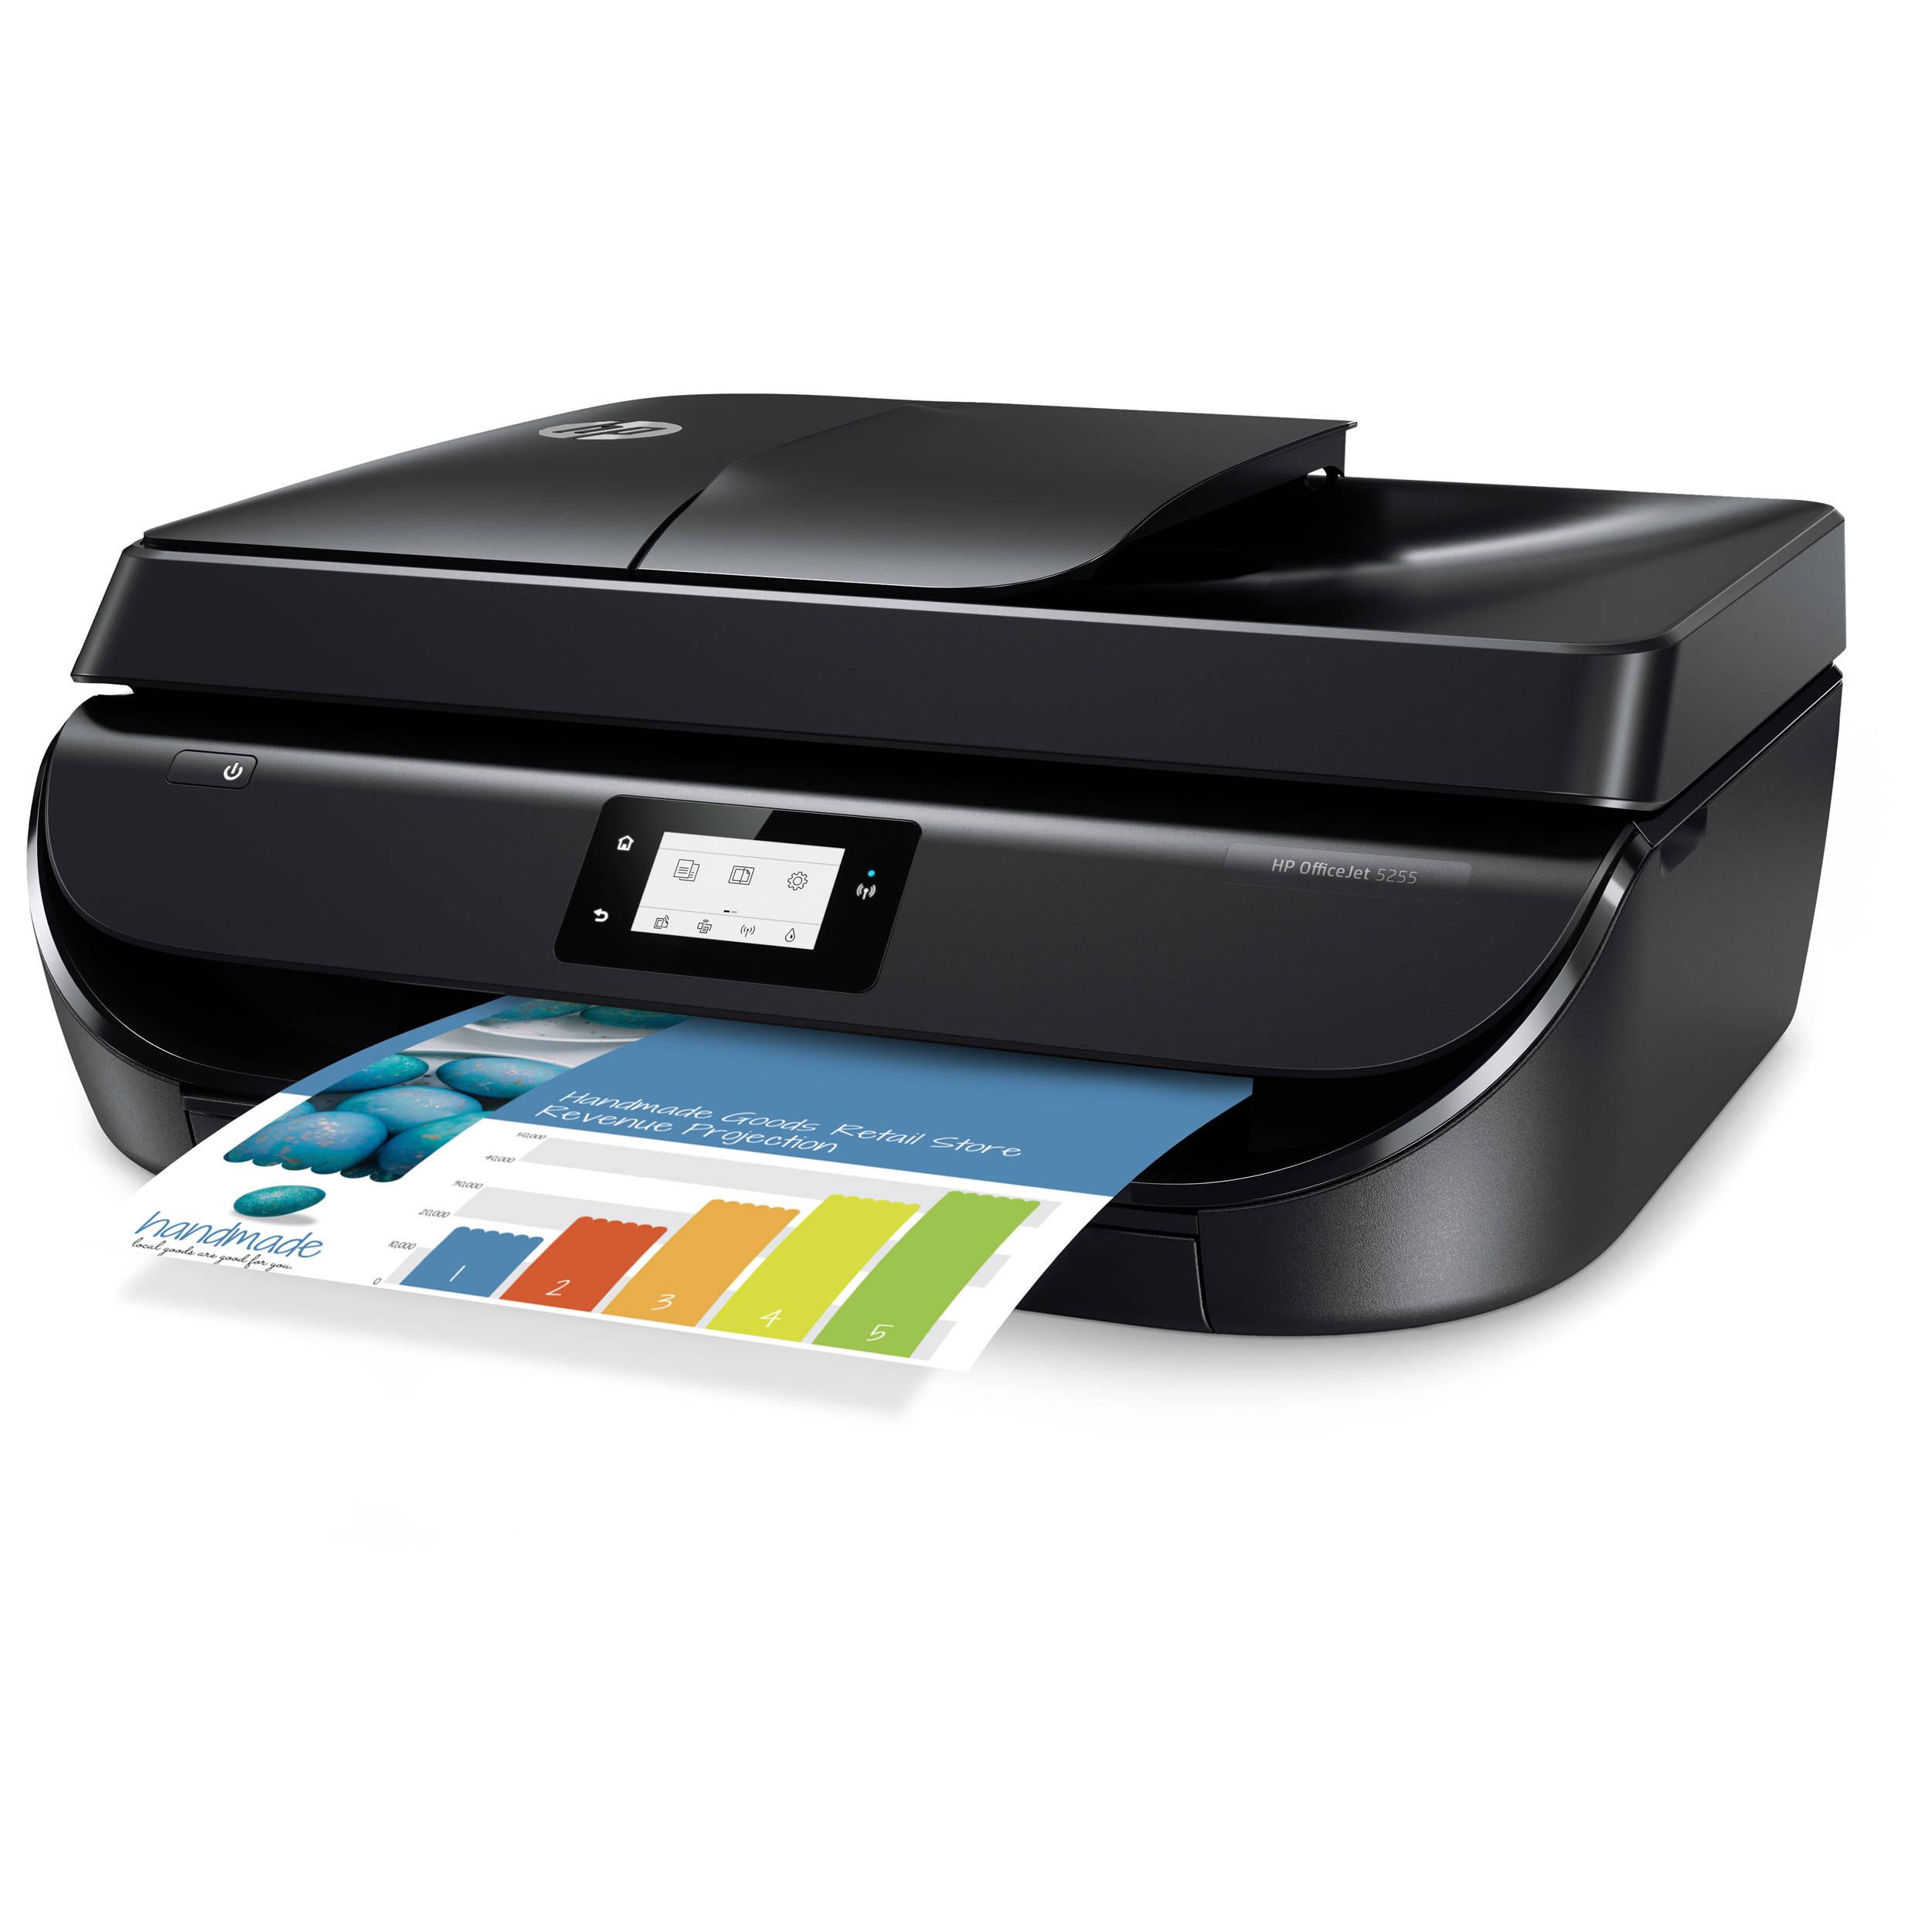 HP OfficeJet 5255 All-in-One Inkjet Printer